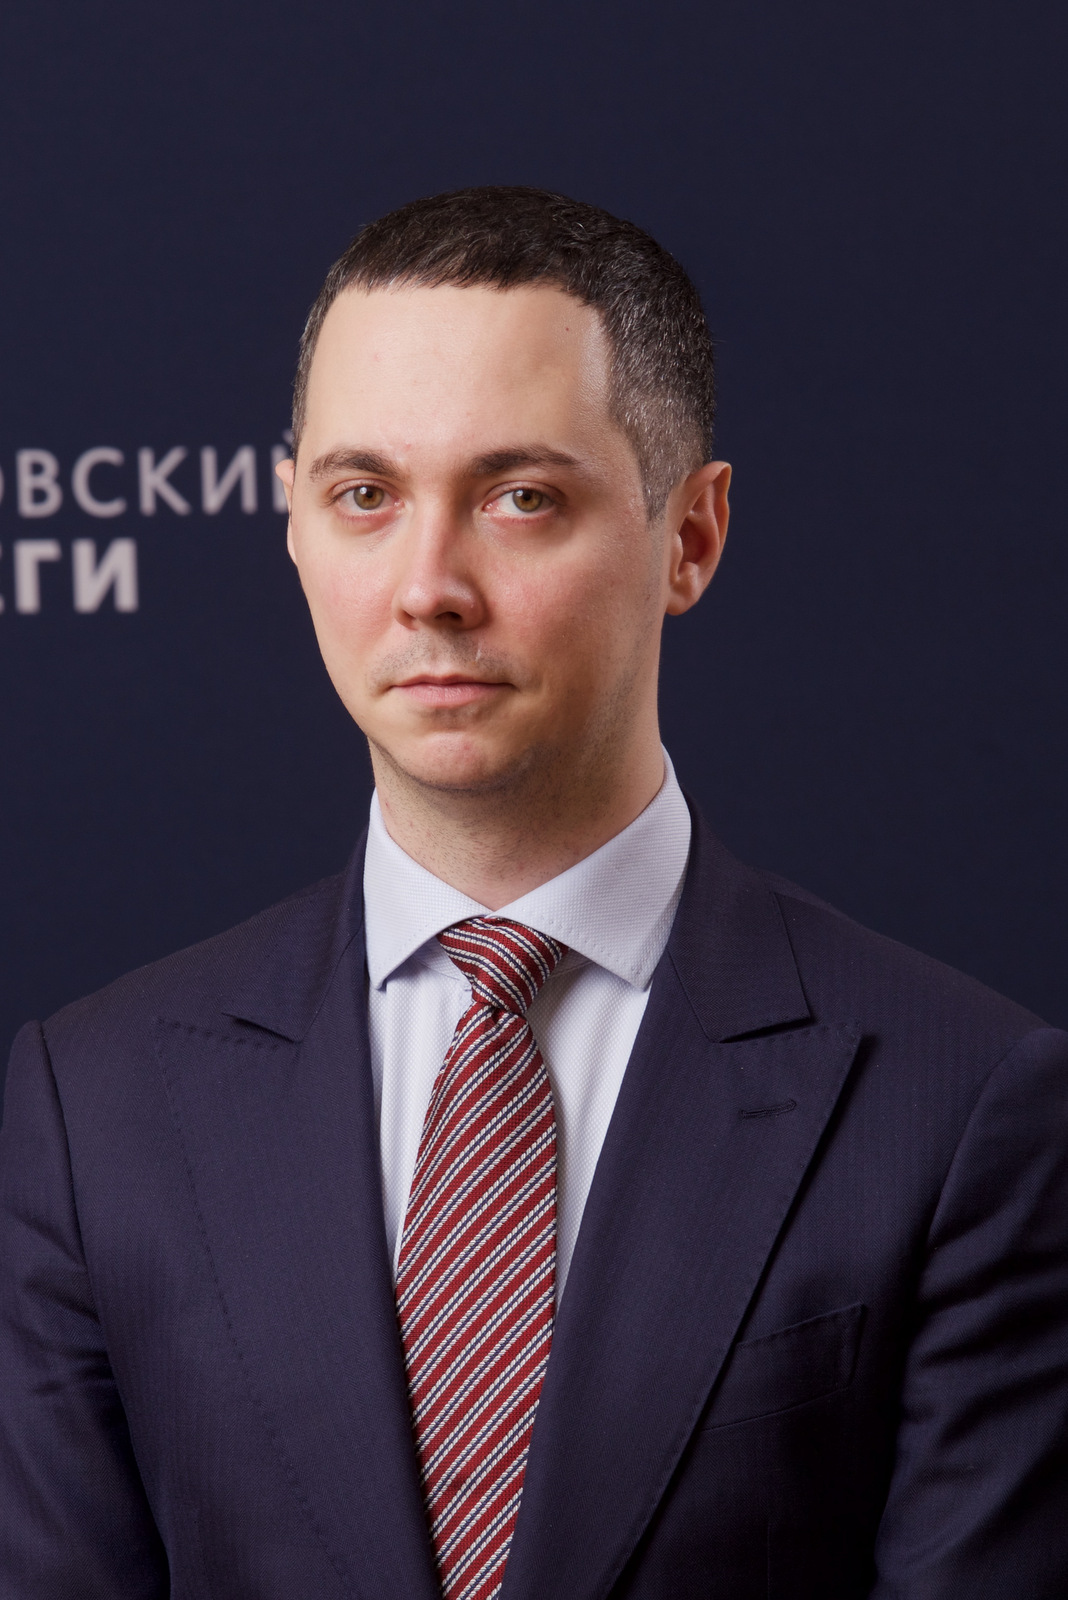 Alexander Gabuev - Carnegie Moscow Center - Carnegie Endowment for International Peace